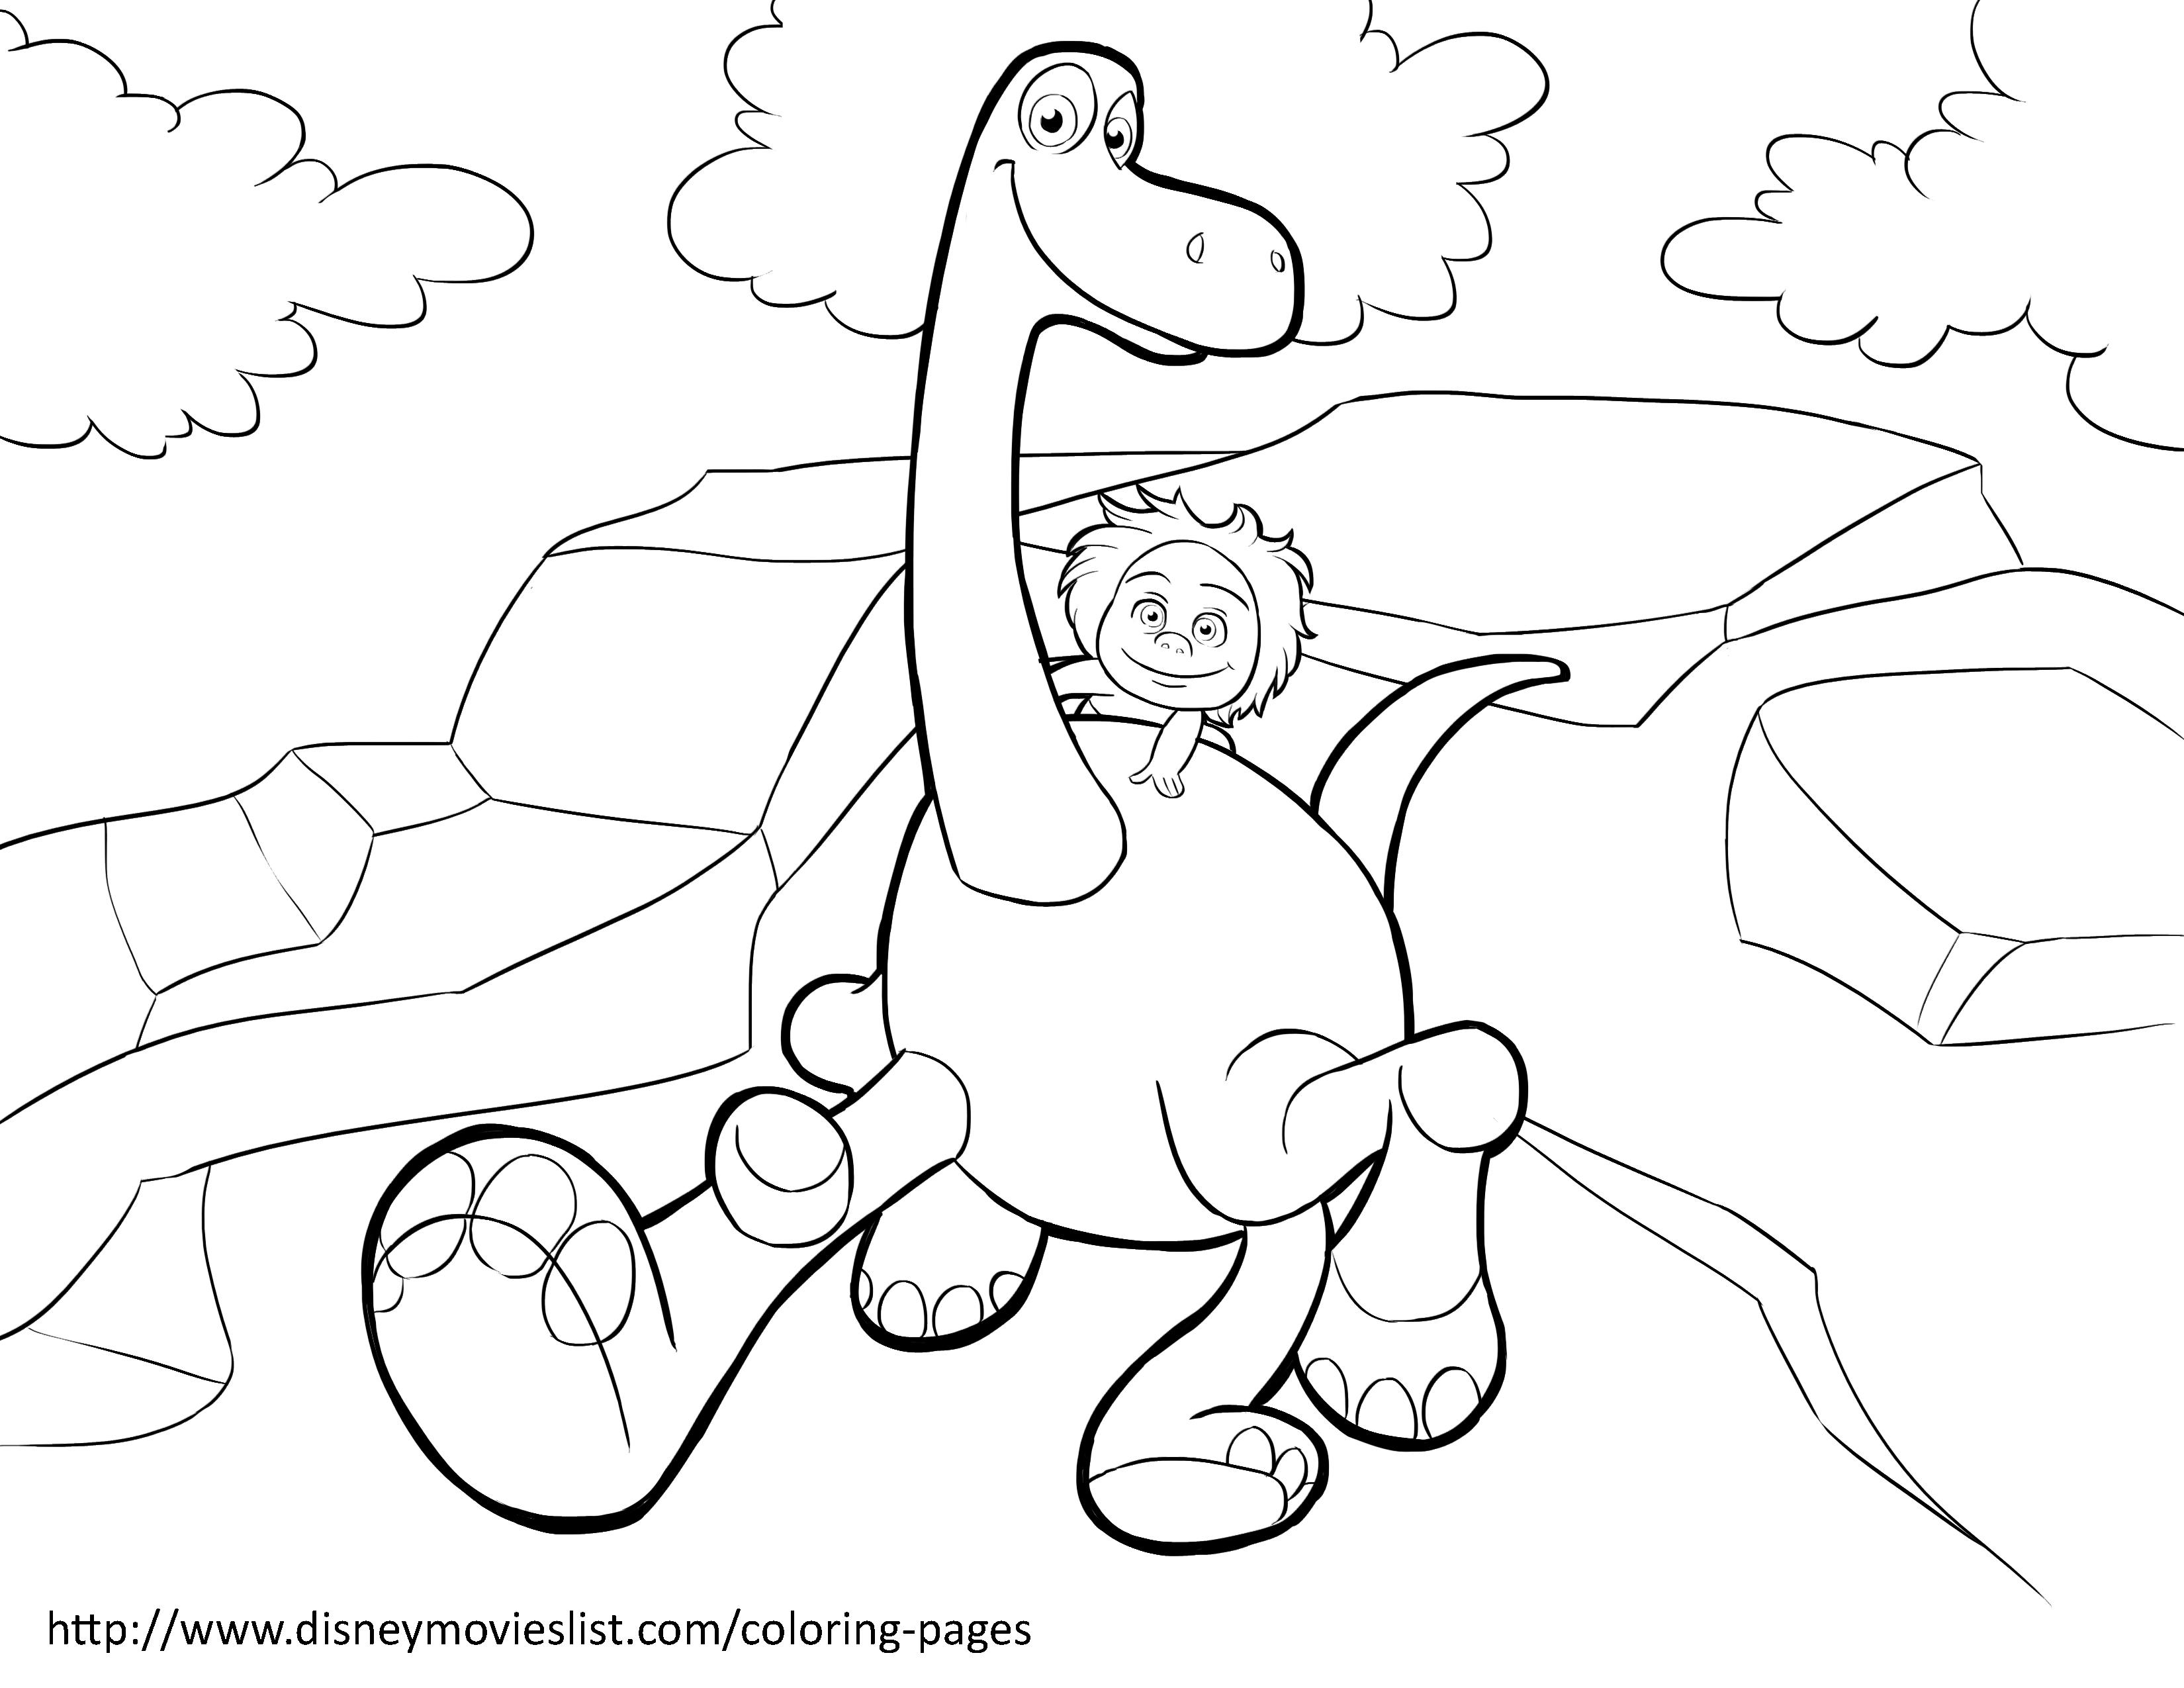 Dinosaur Outline Drawing At Getdrawings